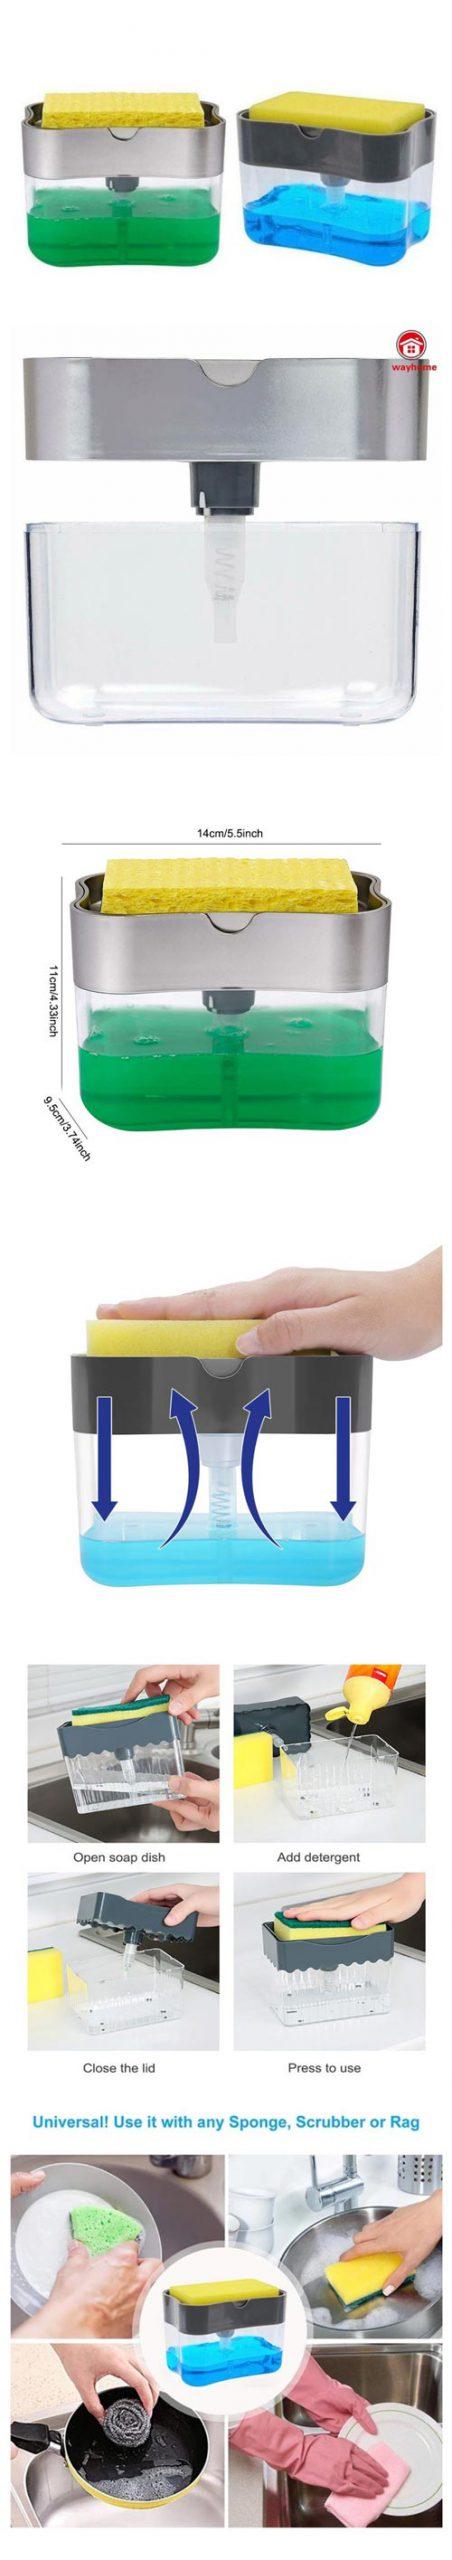 Soap Pump And Sponge Dispenser In Pakistan